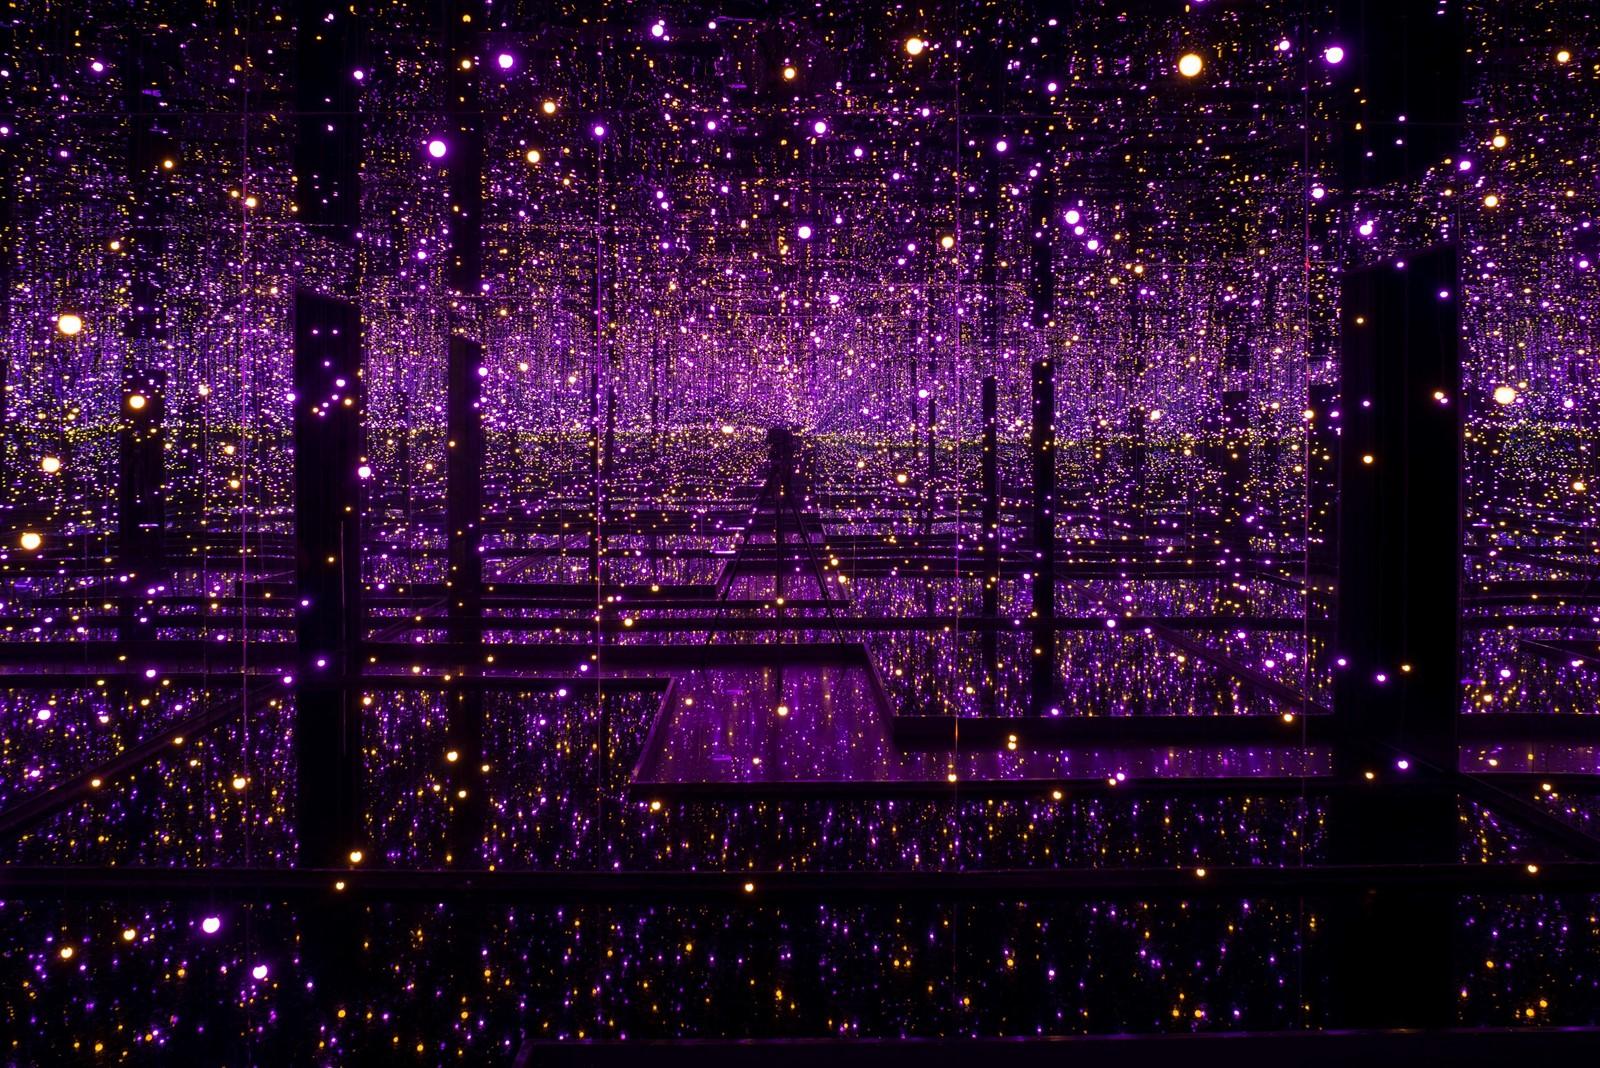 Yayoi Kusama. Infinity Mirrored Room - Filled with the Brilliance of Life 2011/2017. Cortesía Tate